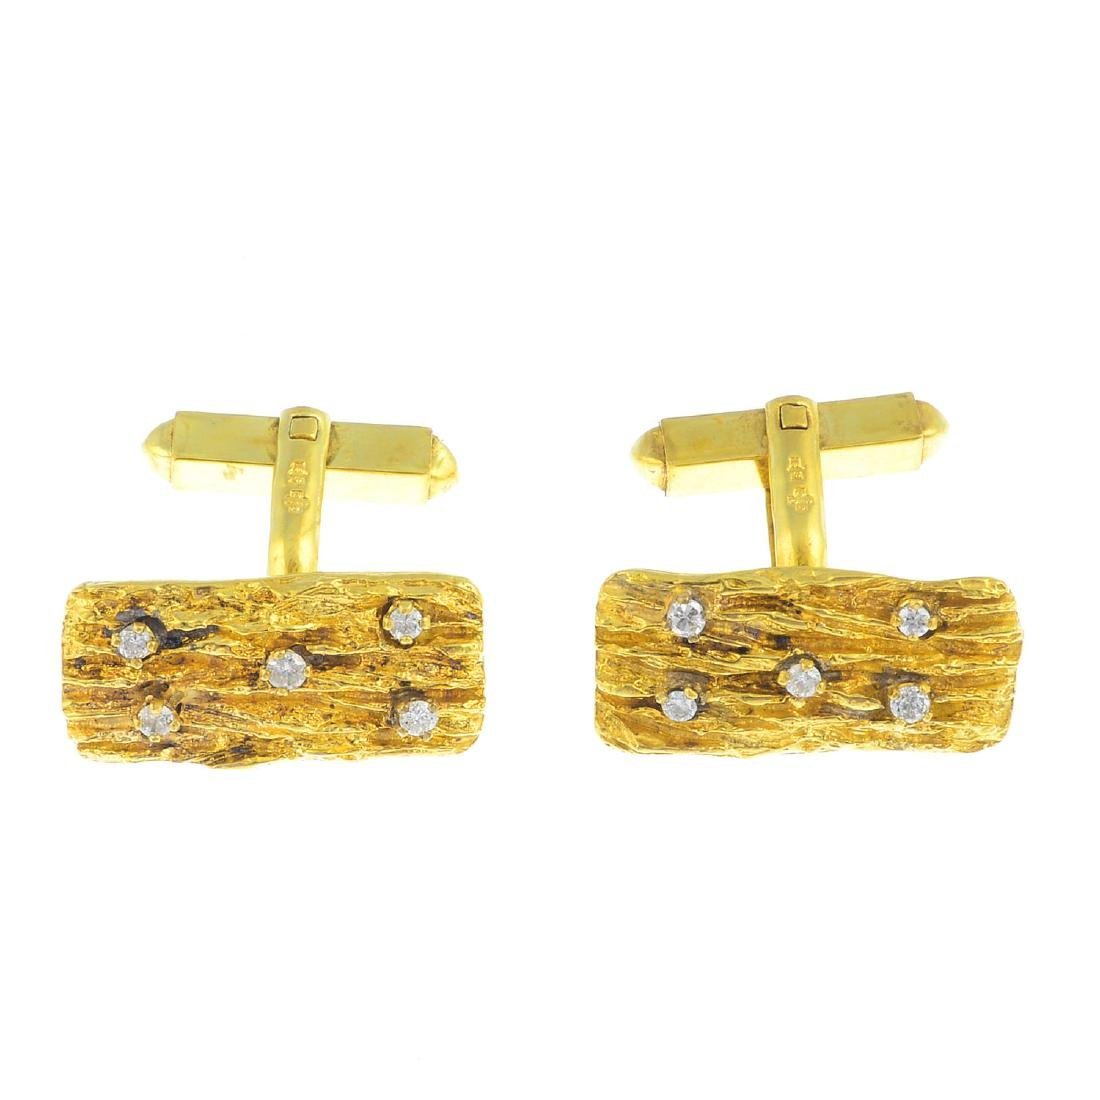 A pair of 18ct gold diamond cufflinks. Each designed as